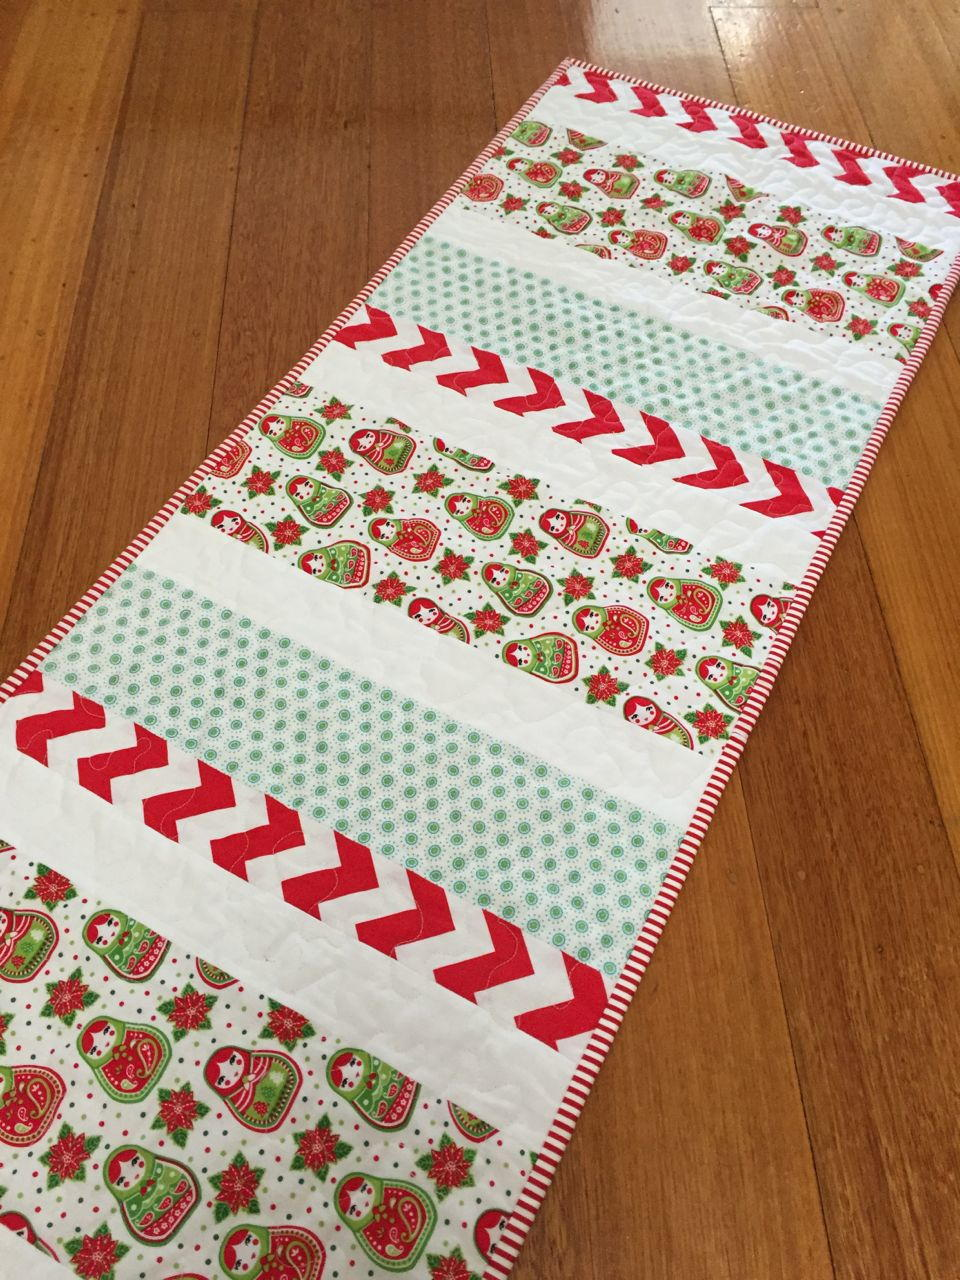 Christmas Table Runner Patterns Stuffed Store Stuffed Store